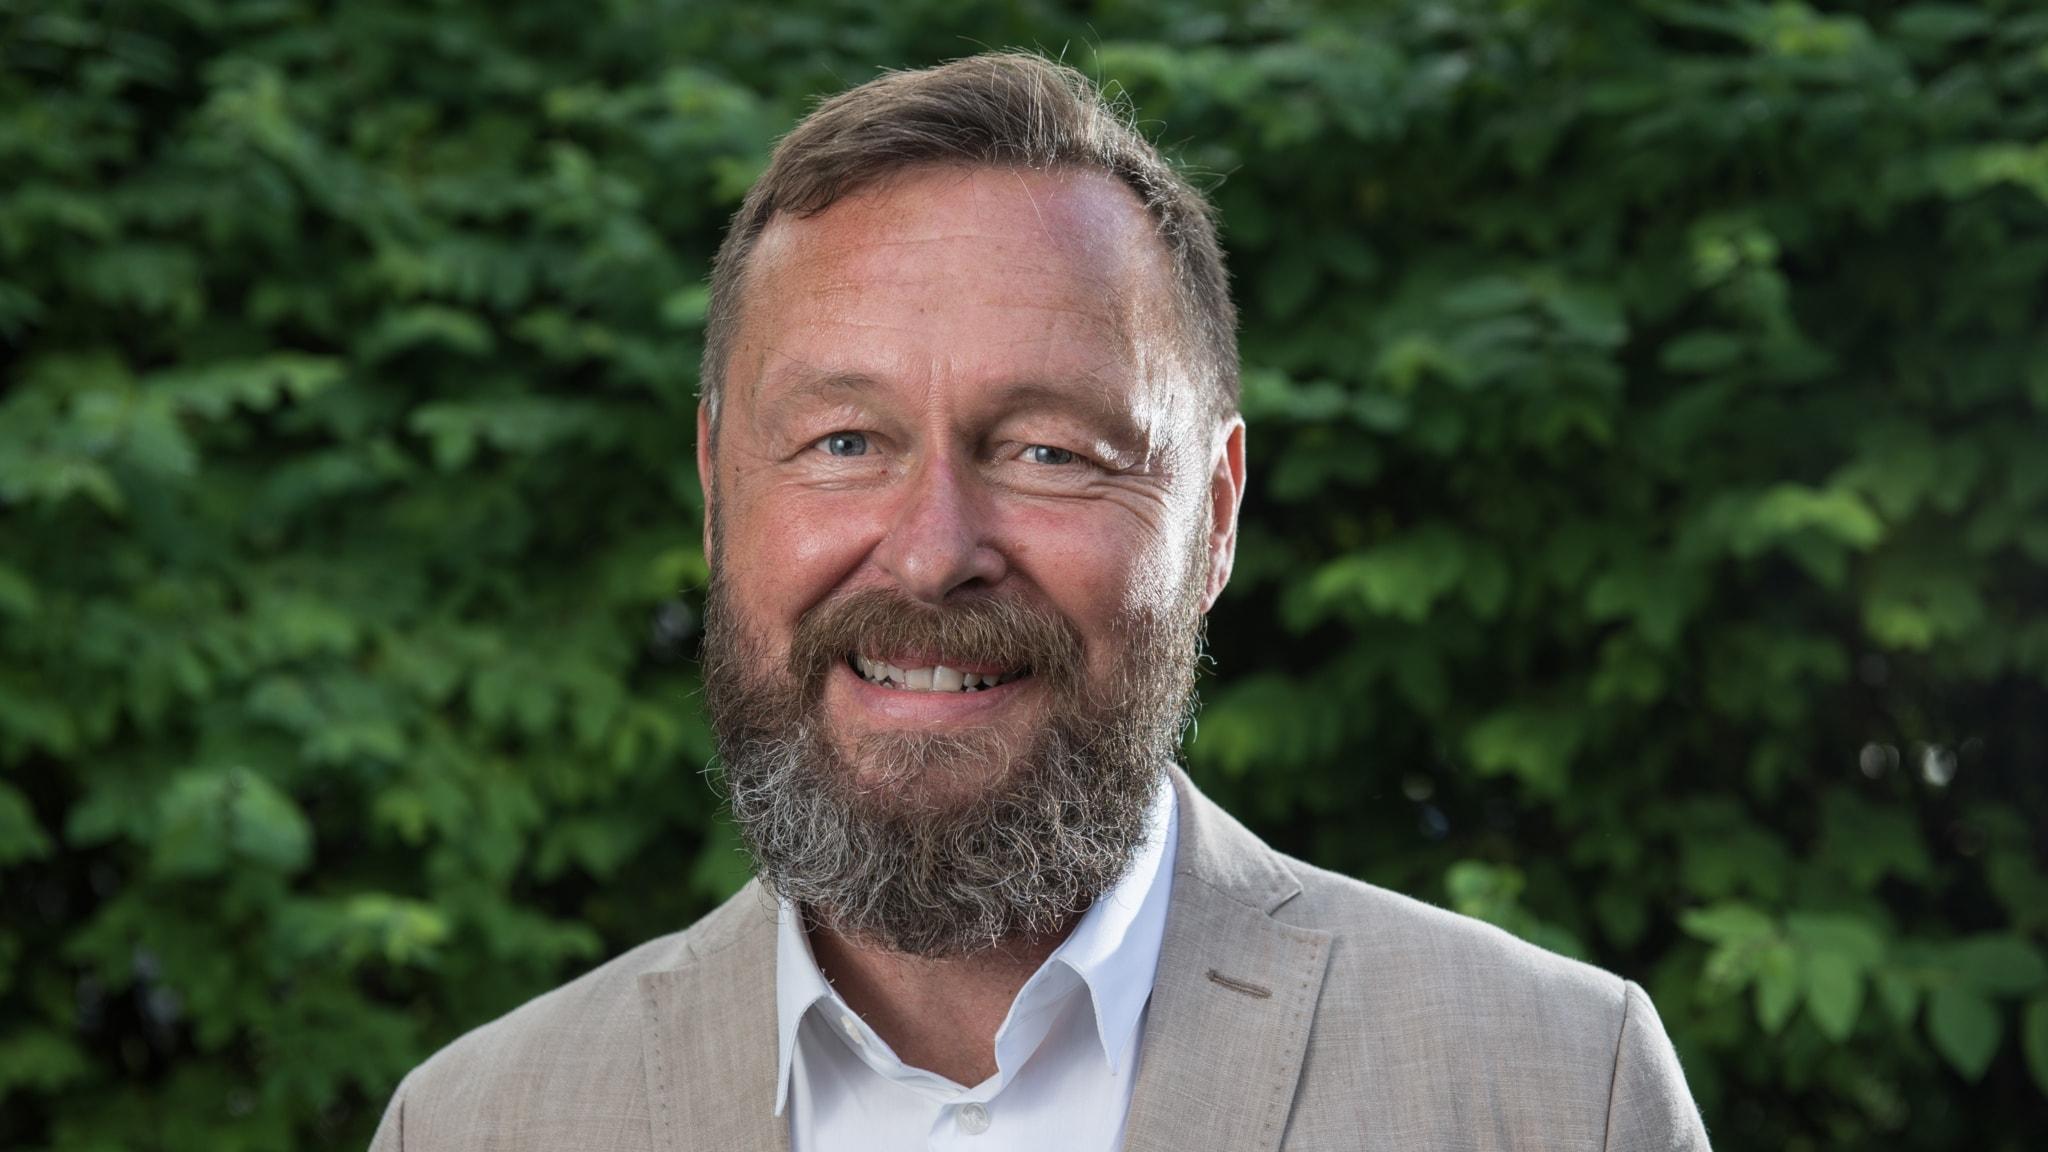 Berndt Arell: